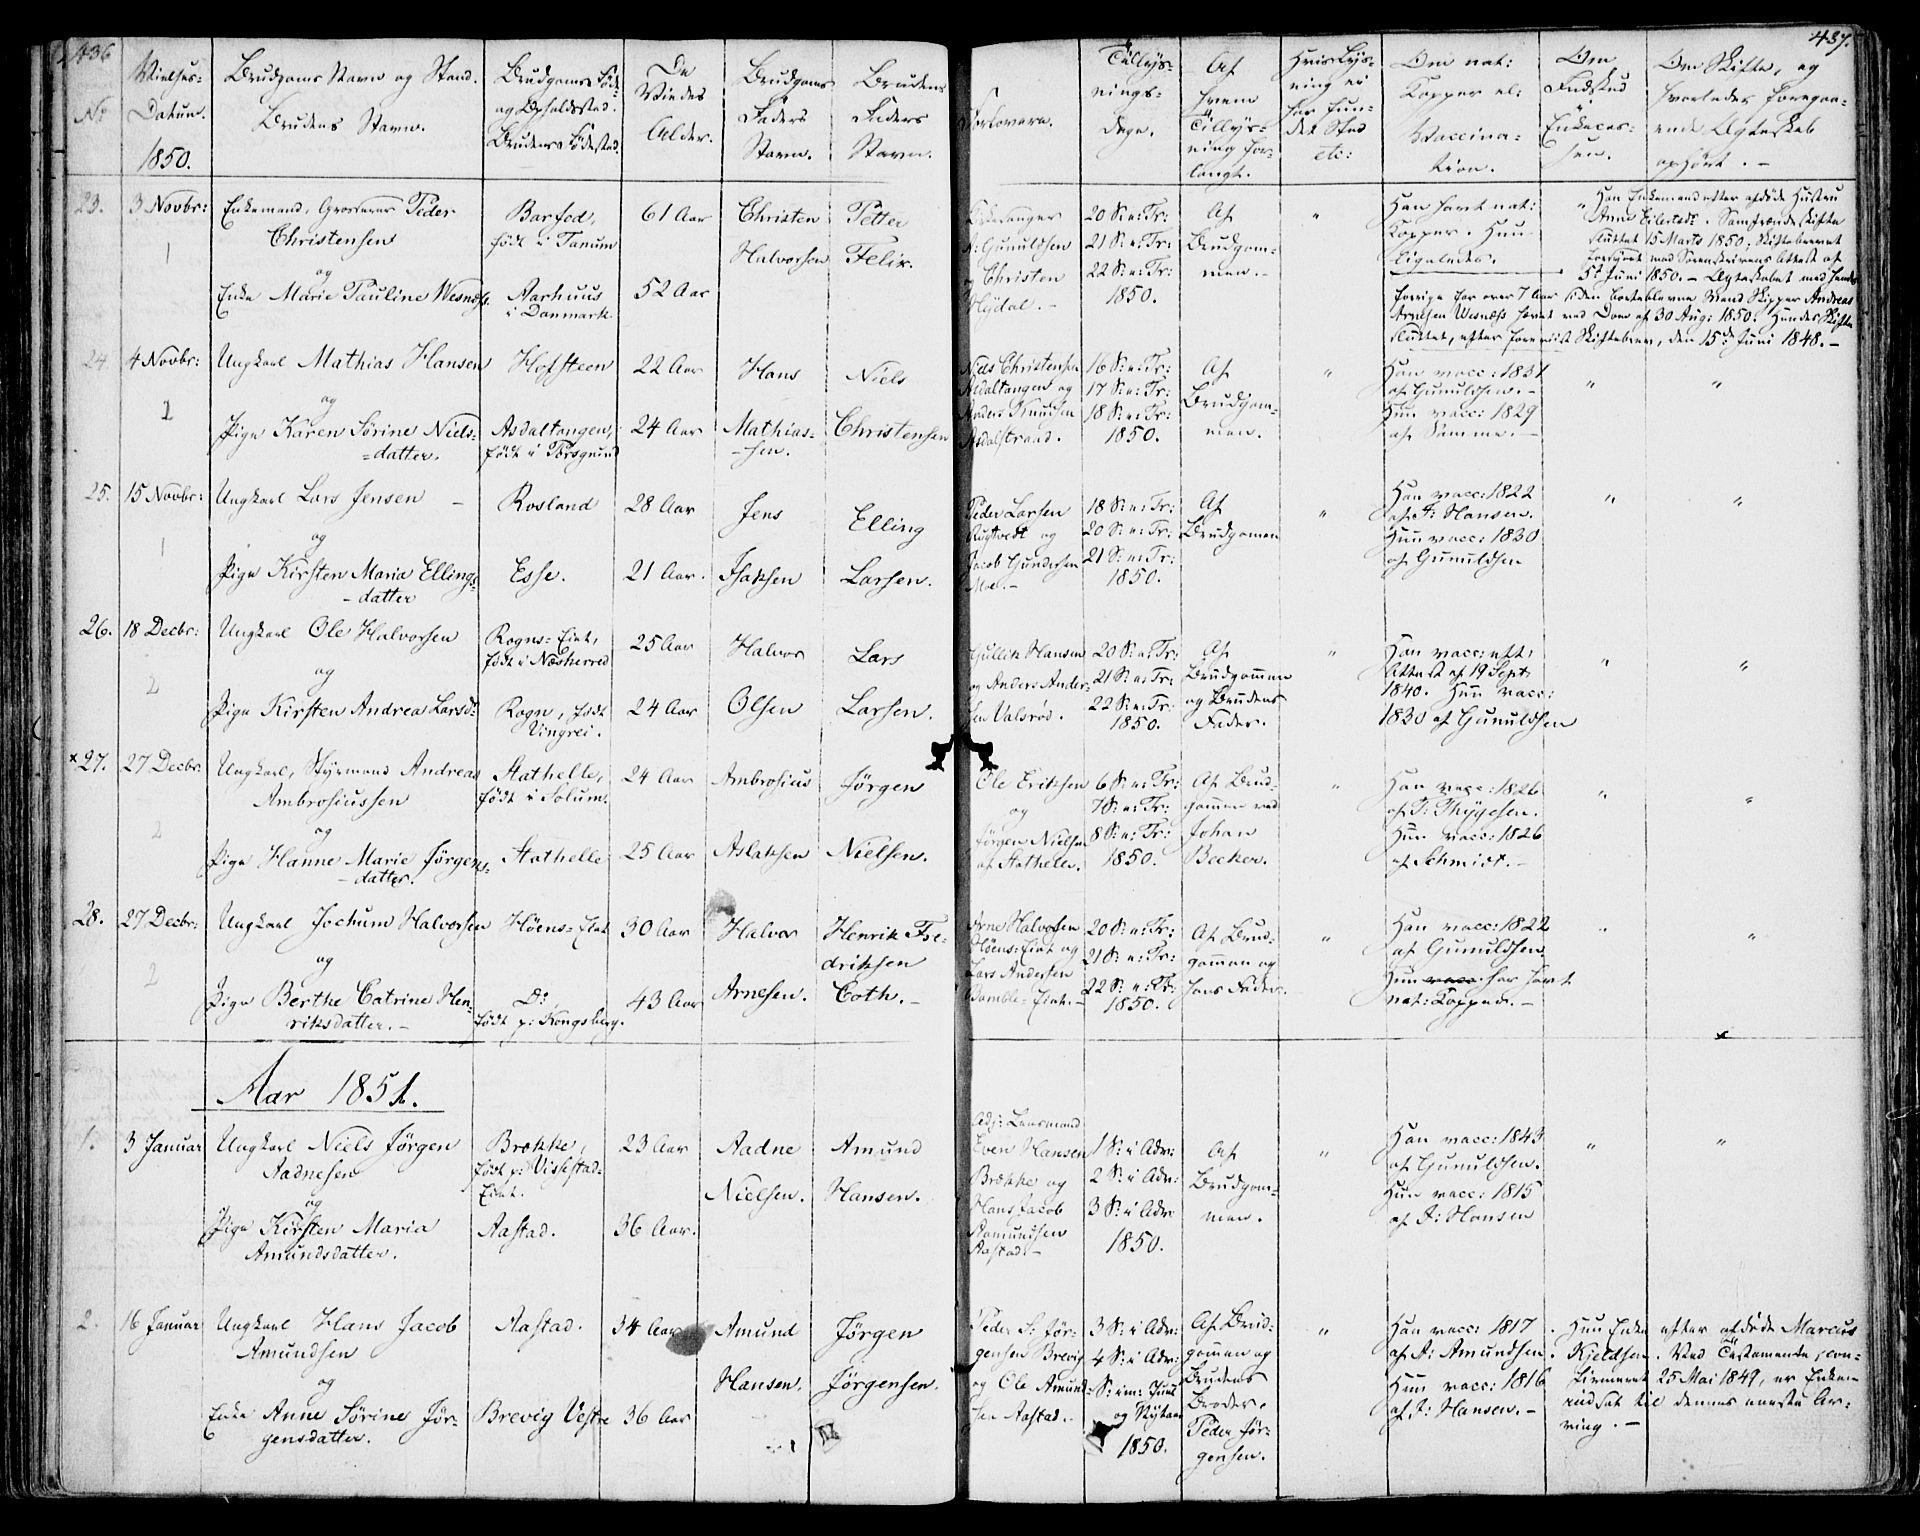 SAKO, Bamble kirkebøker, F/Fa/L0004: Ministerialbok nr. I 4, 1834-1853, s. 436-437